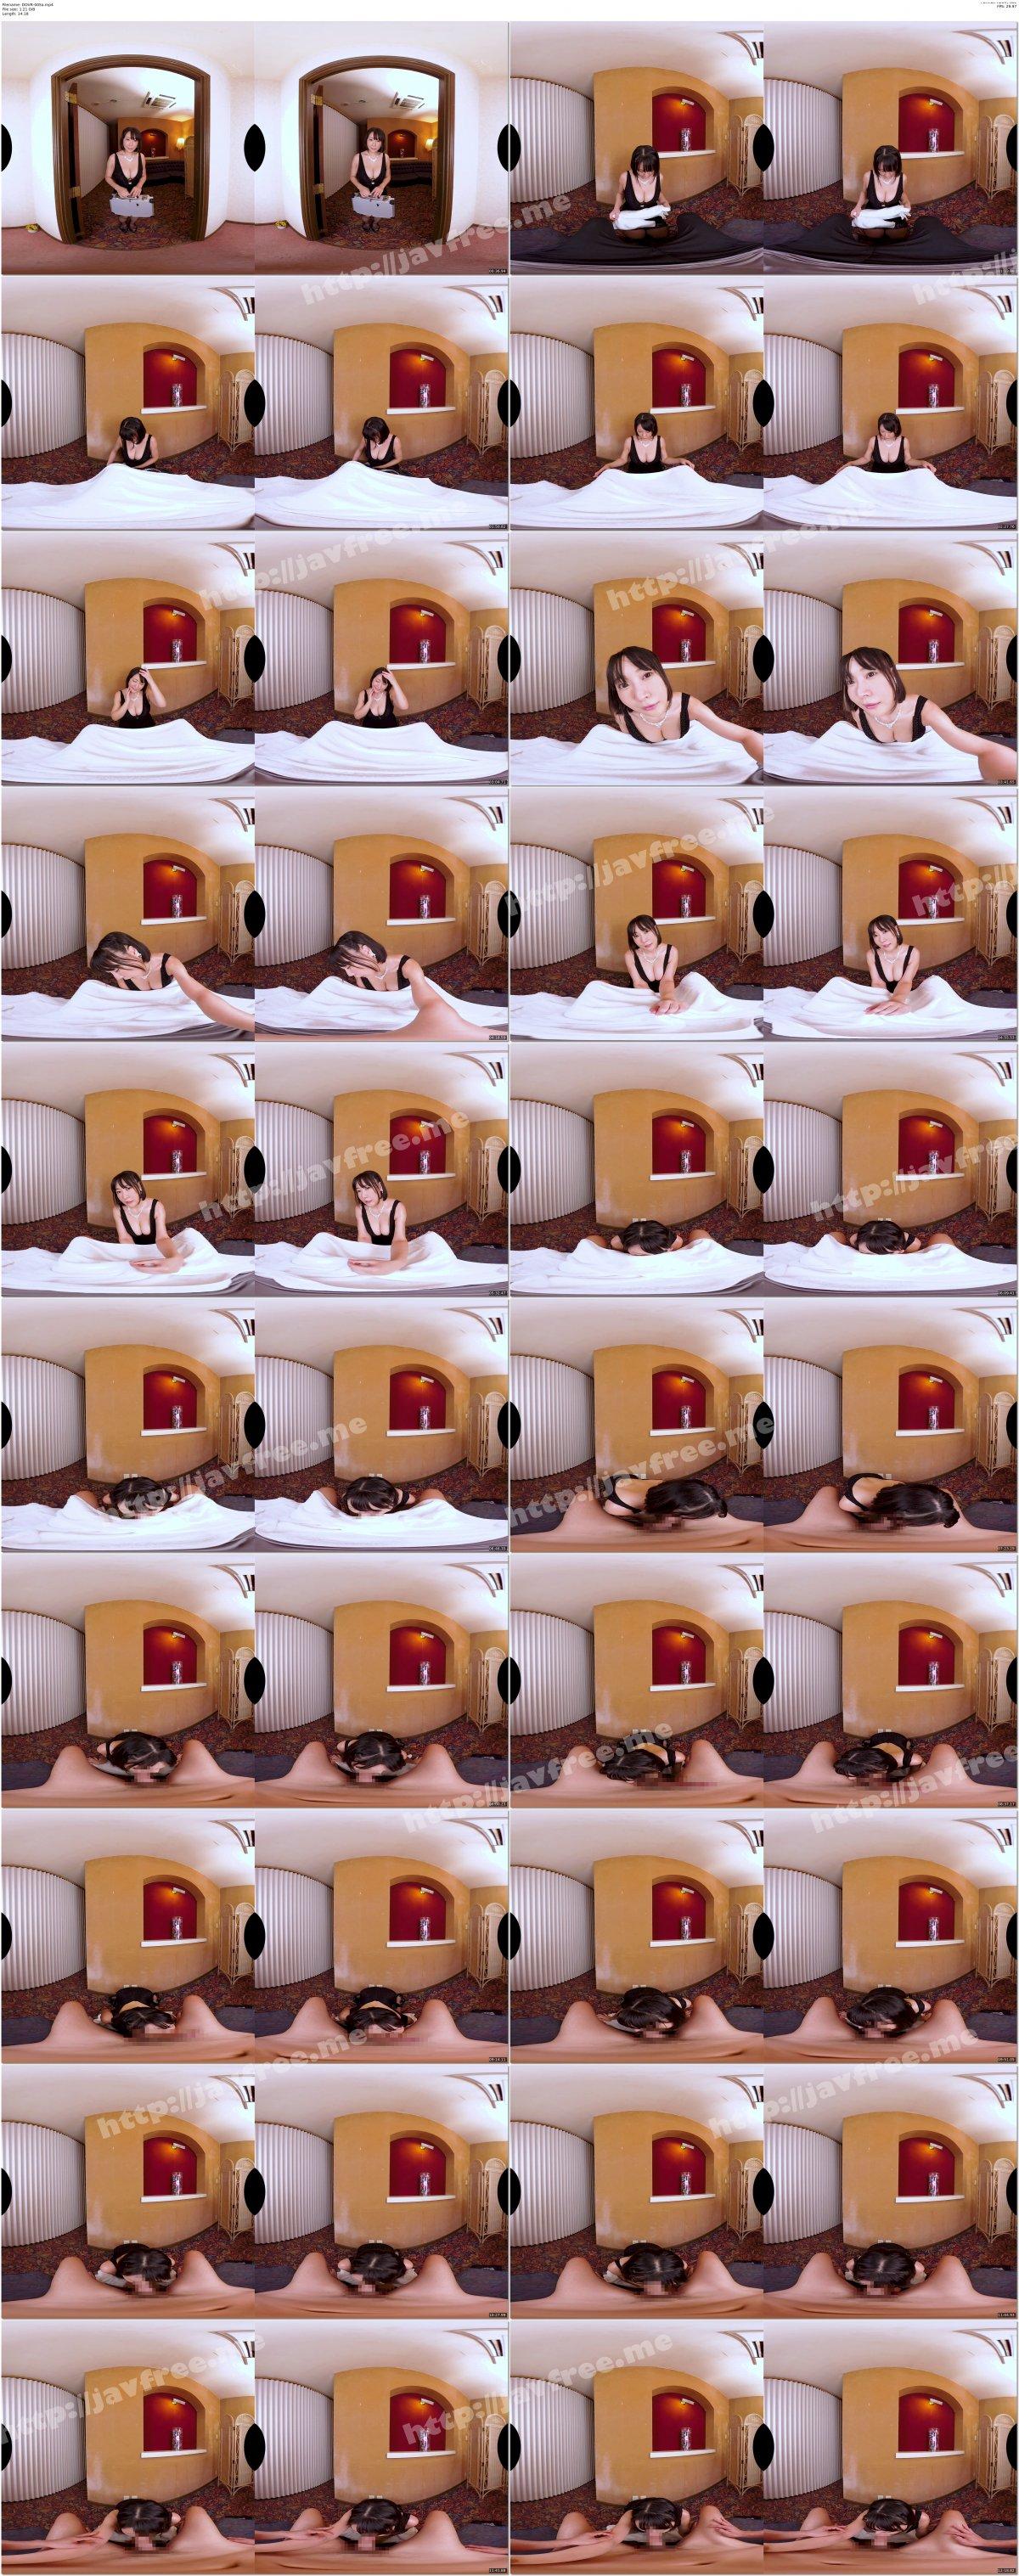 [DOVR-005] 【VR】ねぇ、いっぱい中に出して…」風俗に行ったら超カワイイ子がキタ━━━━(゚∀゚)━━━━!! 超密着風俗フルコースで中出しSEX 羽生ありさ - image DOVR-005a on https://javfree.me